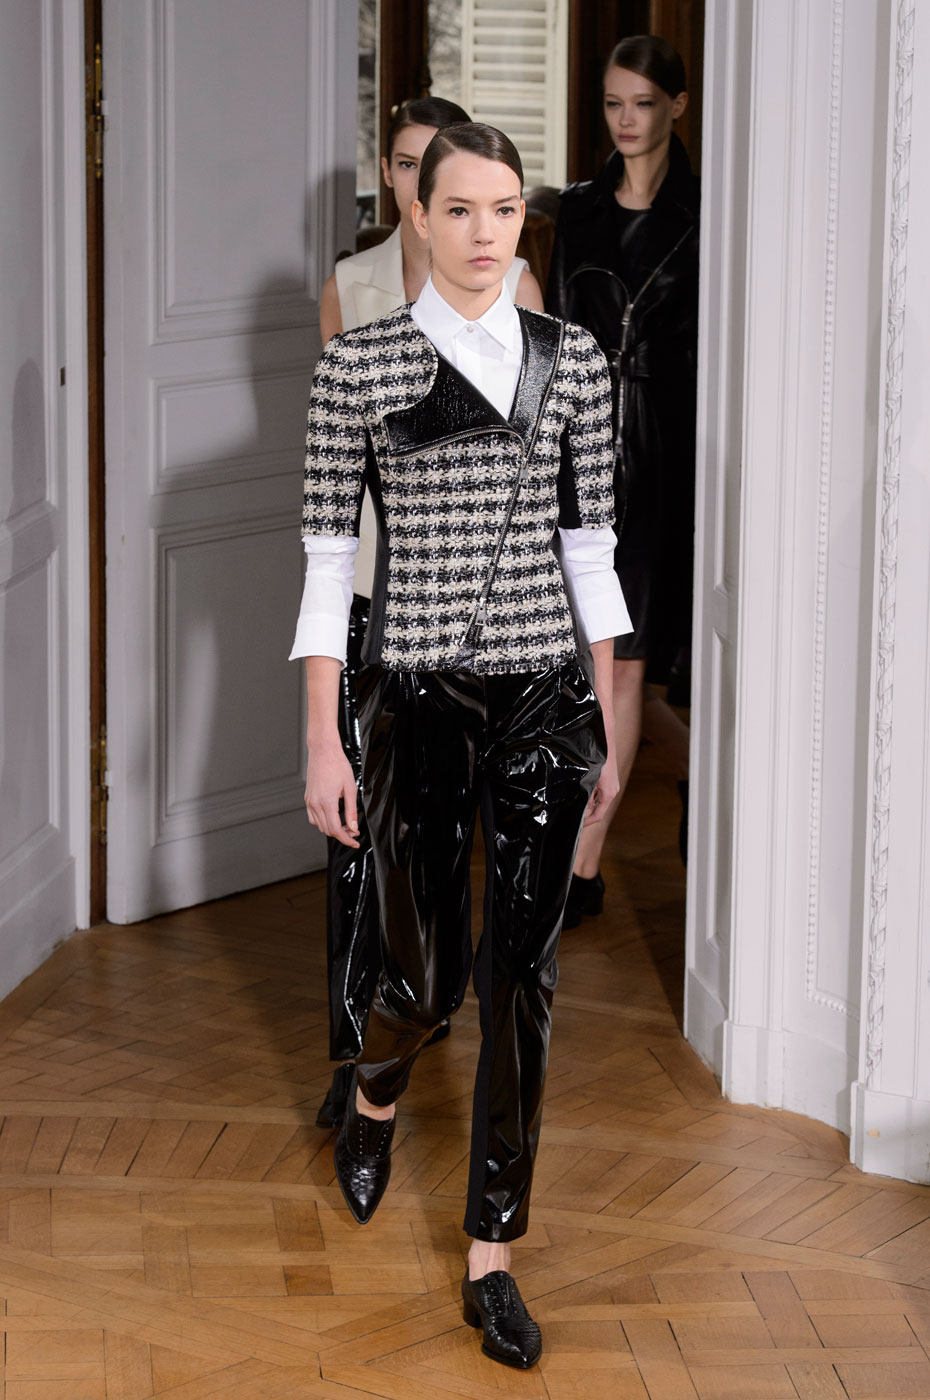 Bouchra-Jarrar-fashion-runway-show-haute-couture-paris-spring-summer-2015-the-impression-51